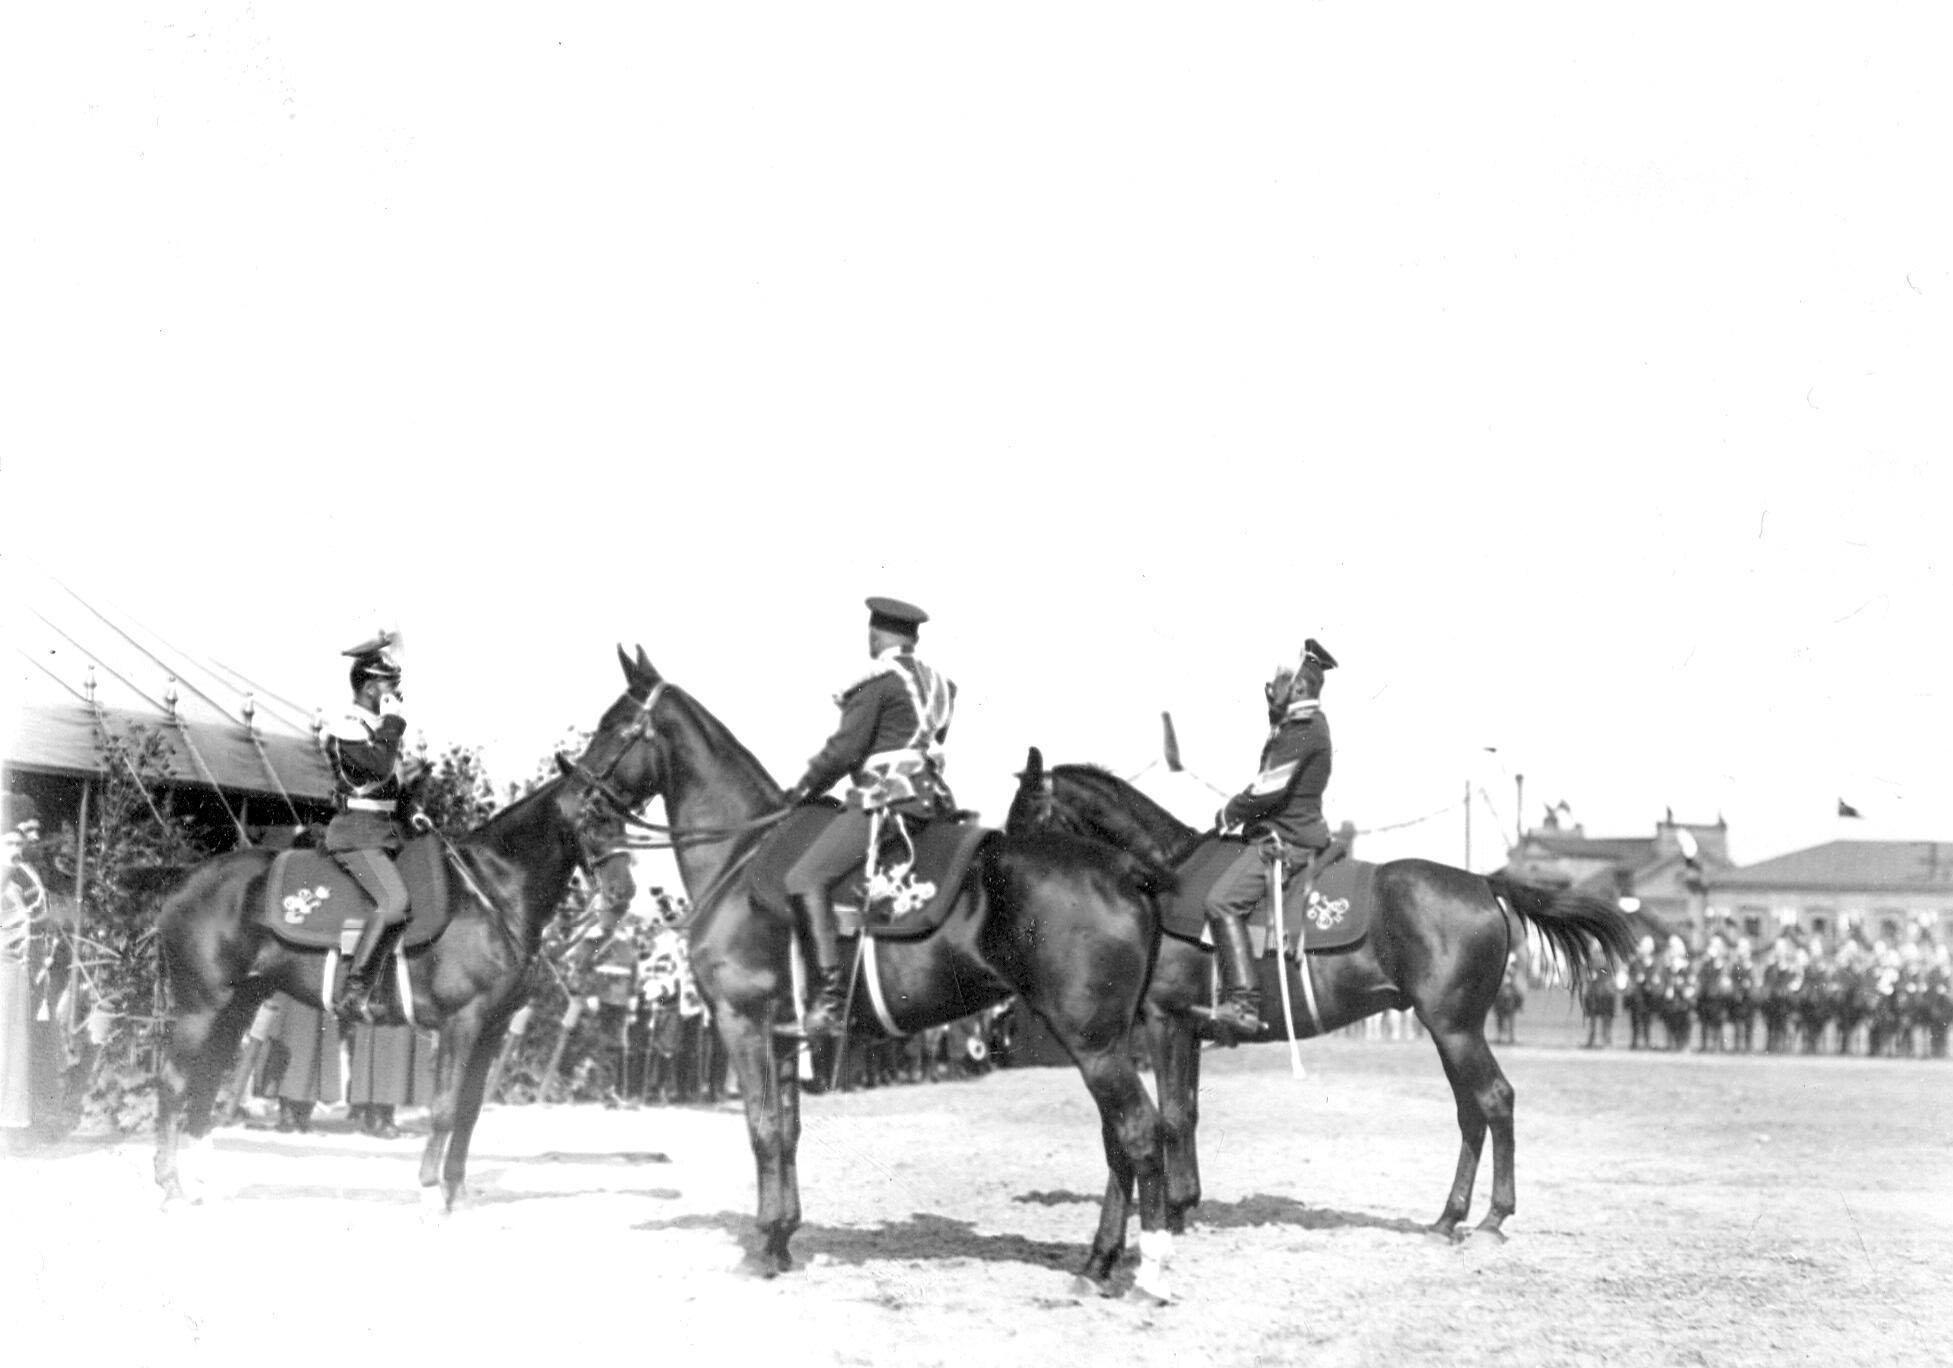 Император Николай II и командир полка генерал-майор Л.Н.фон Баумгартен на параде в день празднования 250-летнего юбилея полка. Справа - вахмистр эскадрона его величества